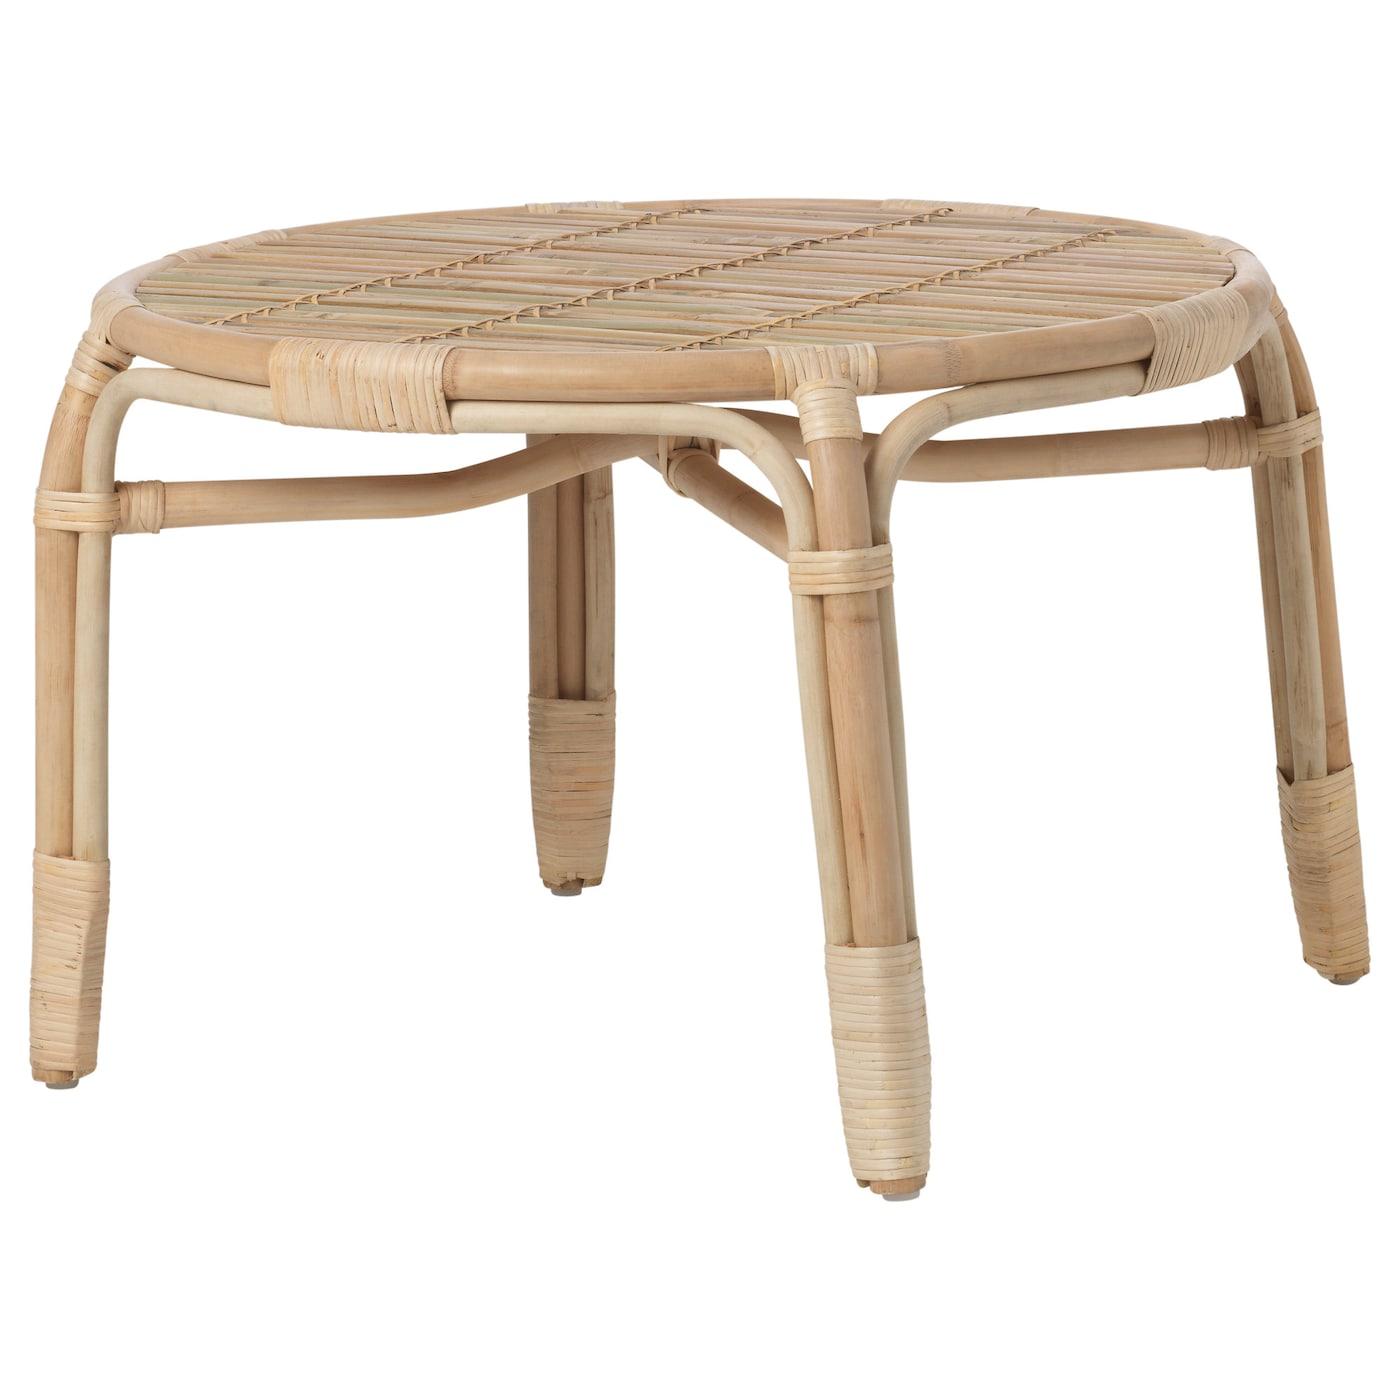 Beau IKEA MASTHOLMEN Coffee Table, Outdoor